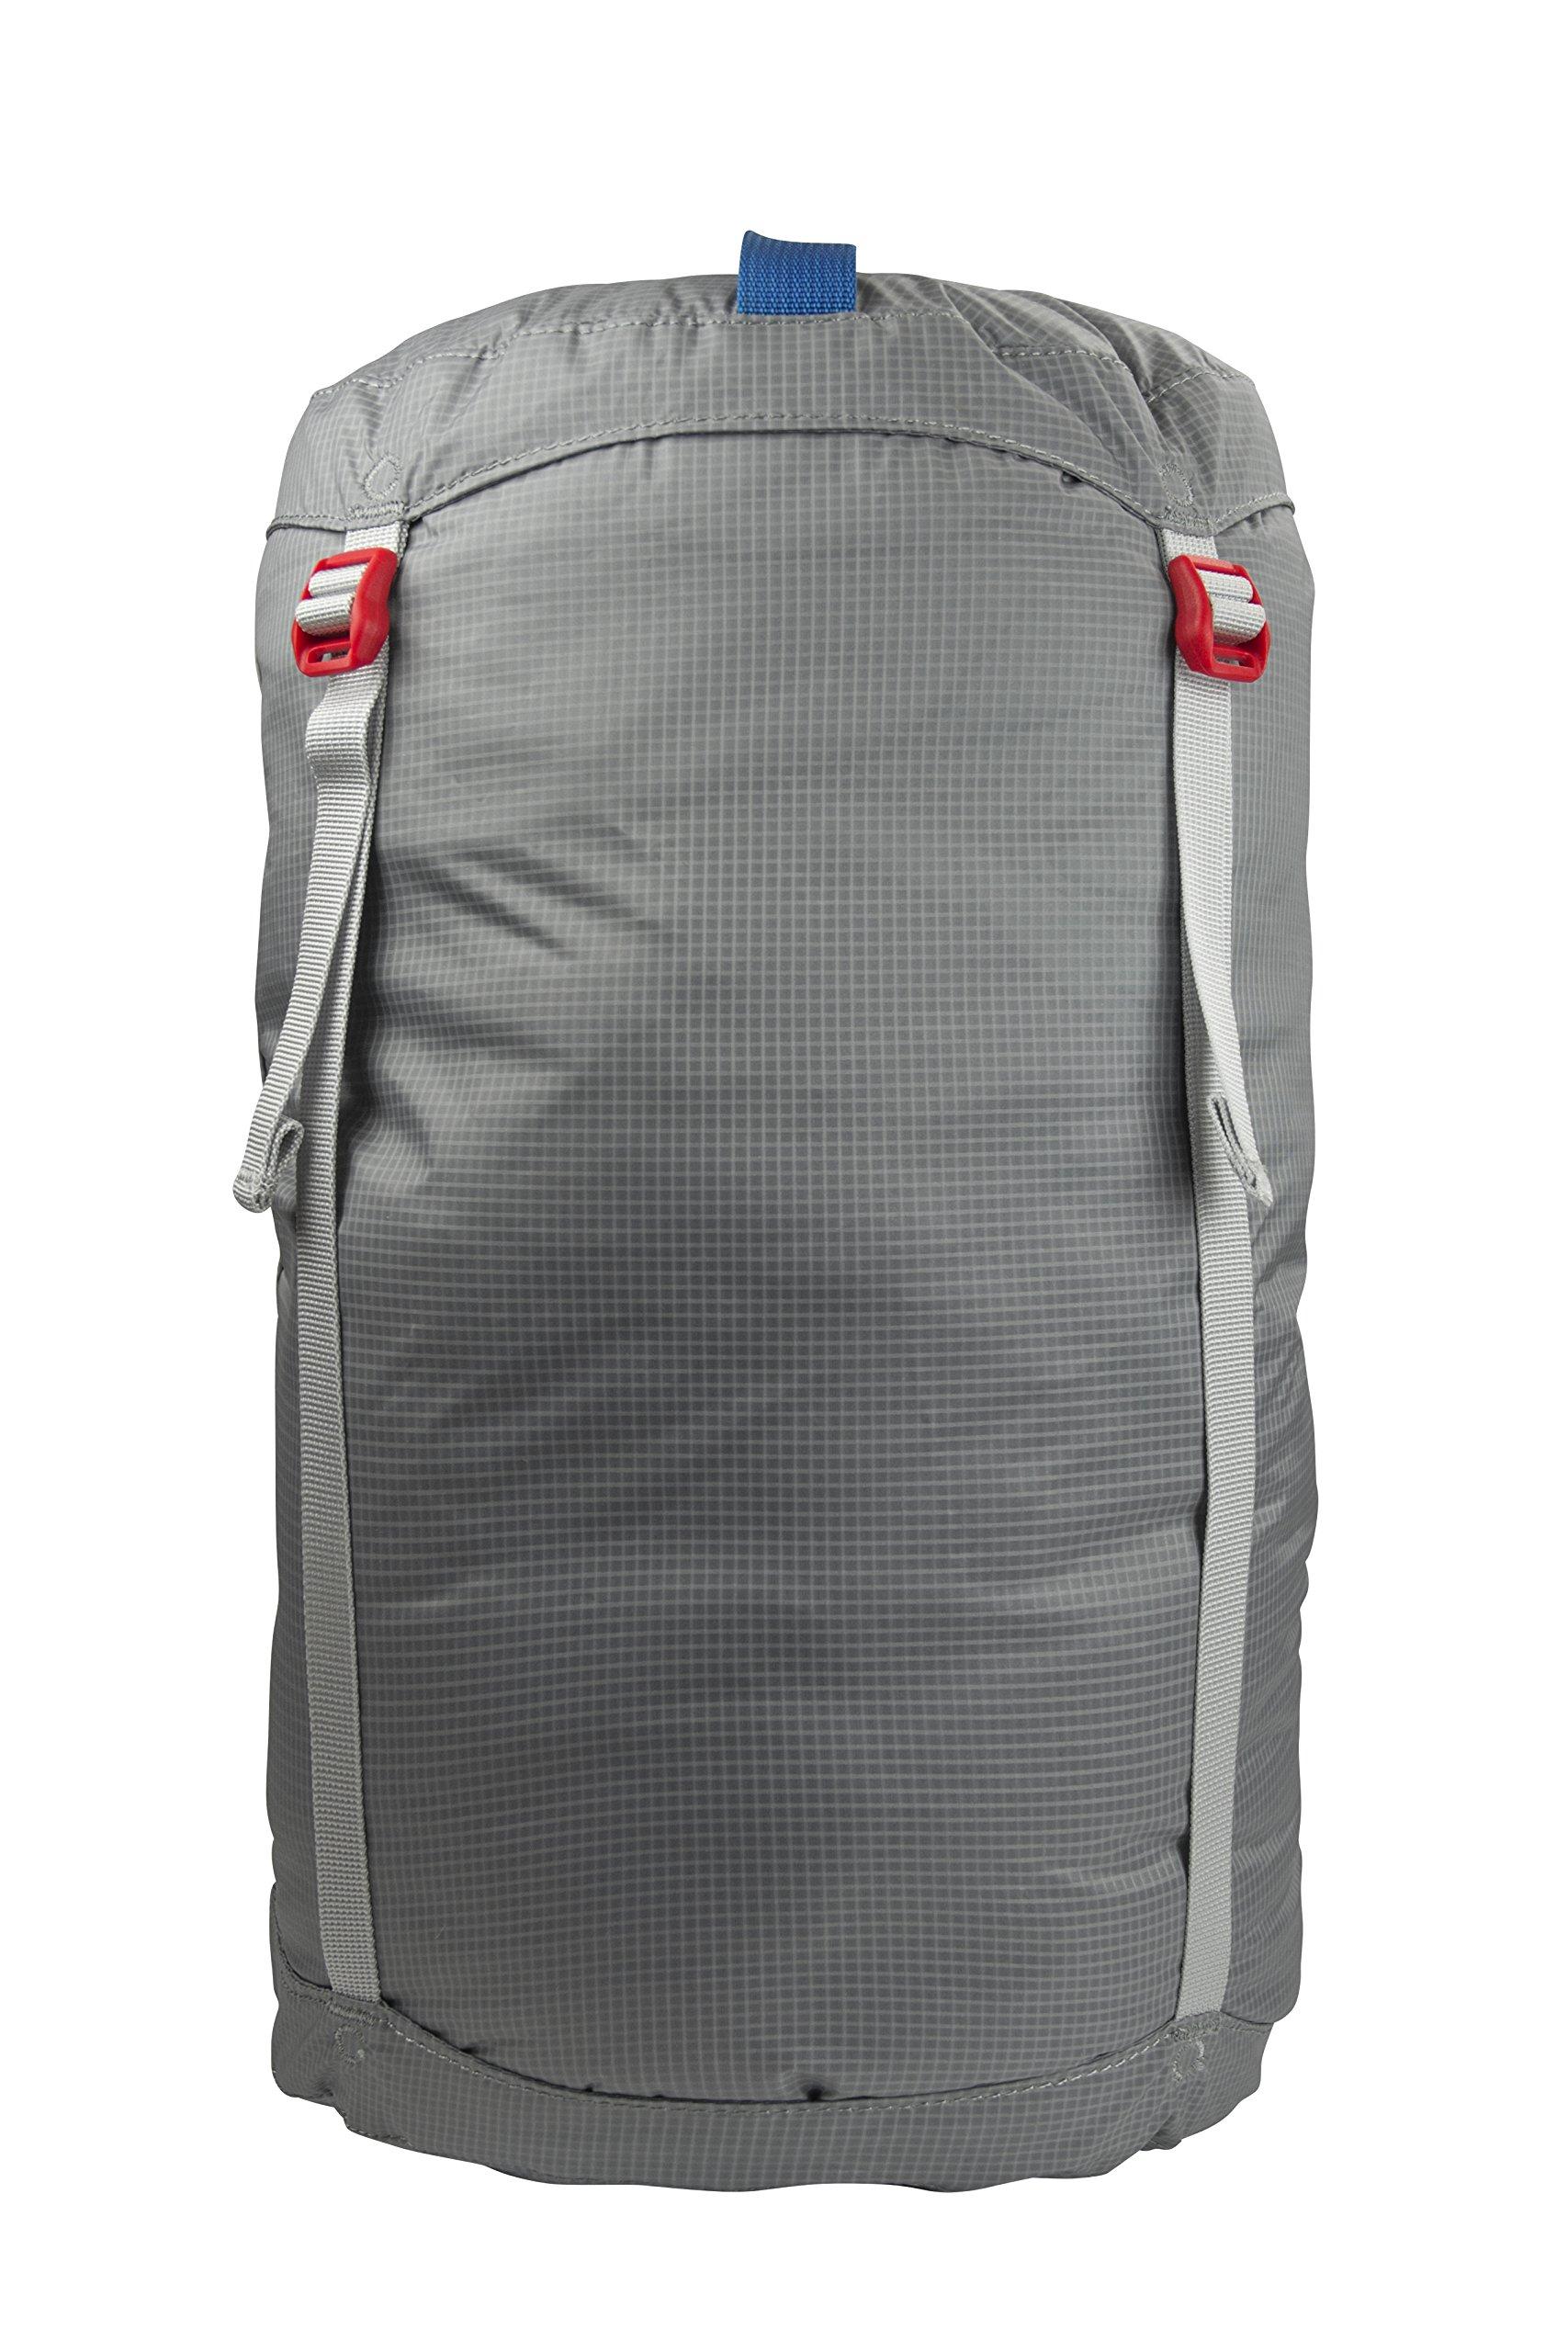 Big Agnes Tech Compression Sack, Gray, 14L by Big Agnes